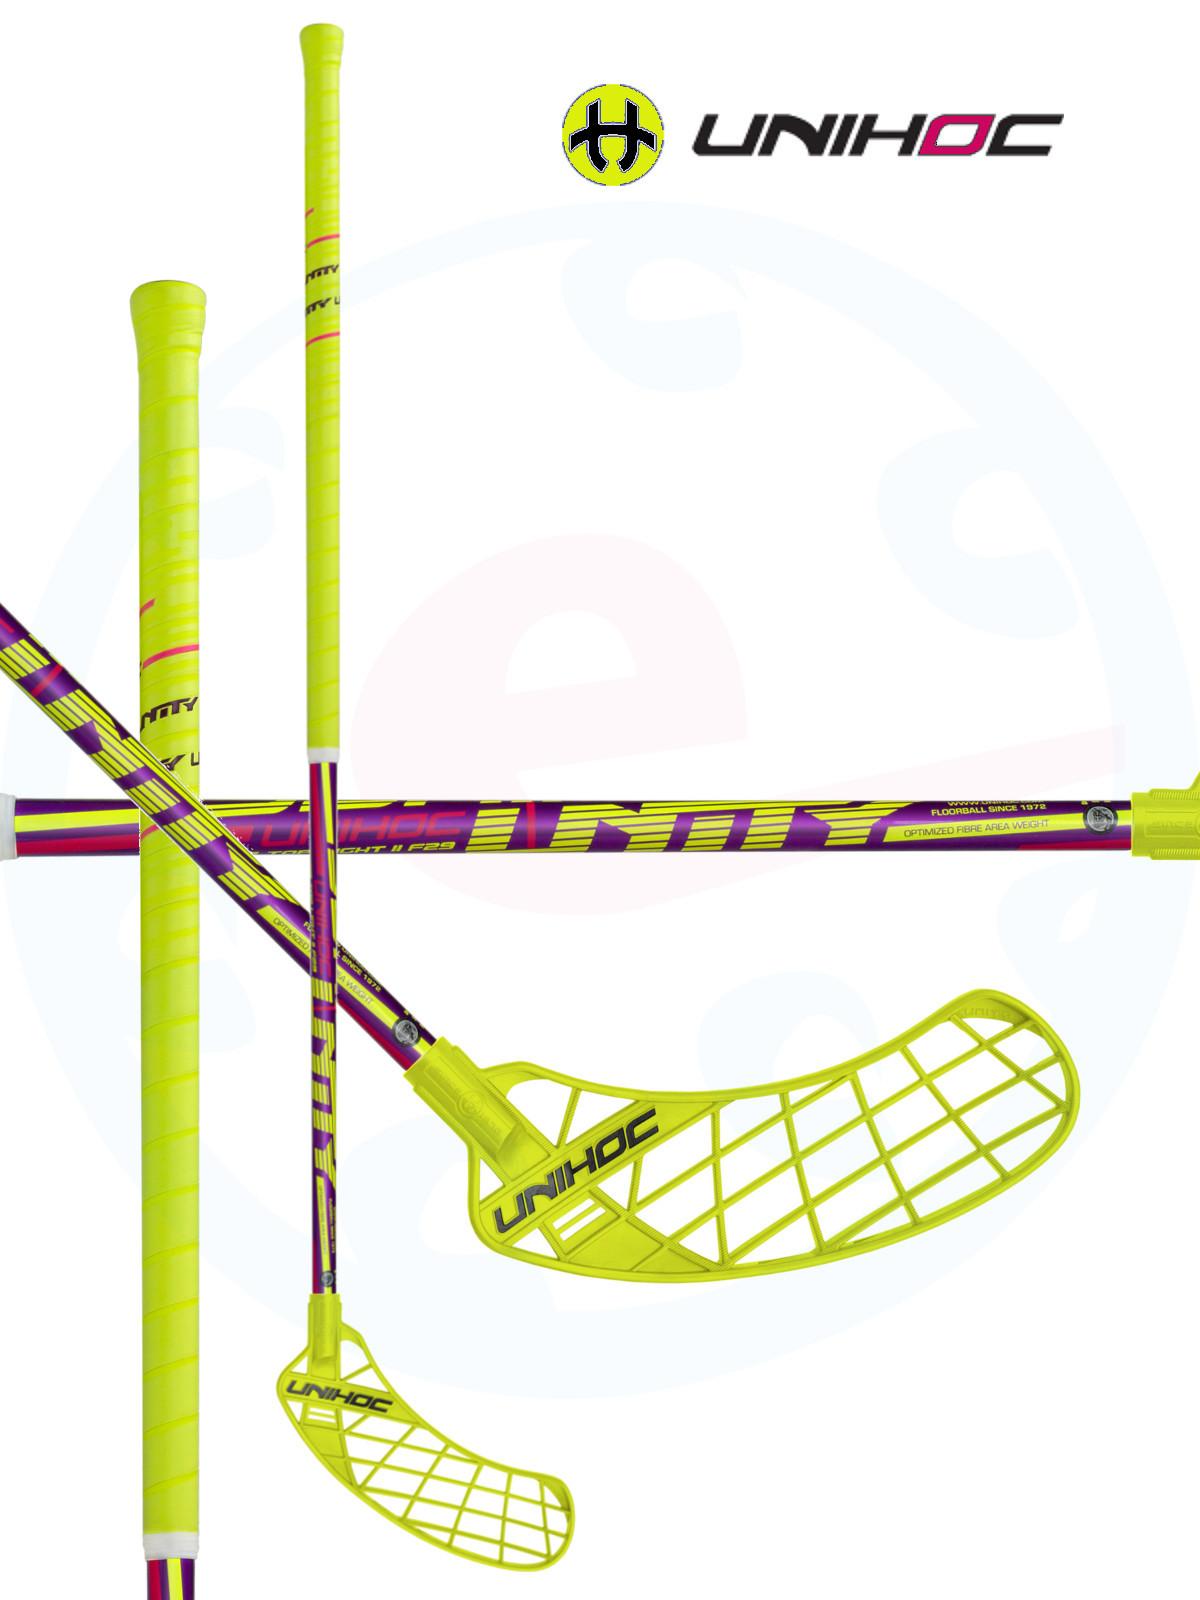 Floorball stick Unihoc UNITY Top Light II 29 neon yellow